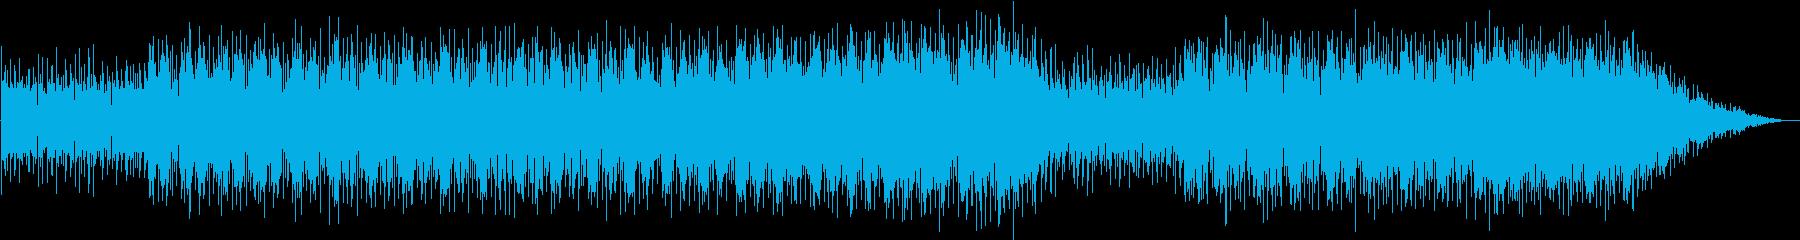 80sアジアンテイストシンセミュージックの再生済みの波形